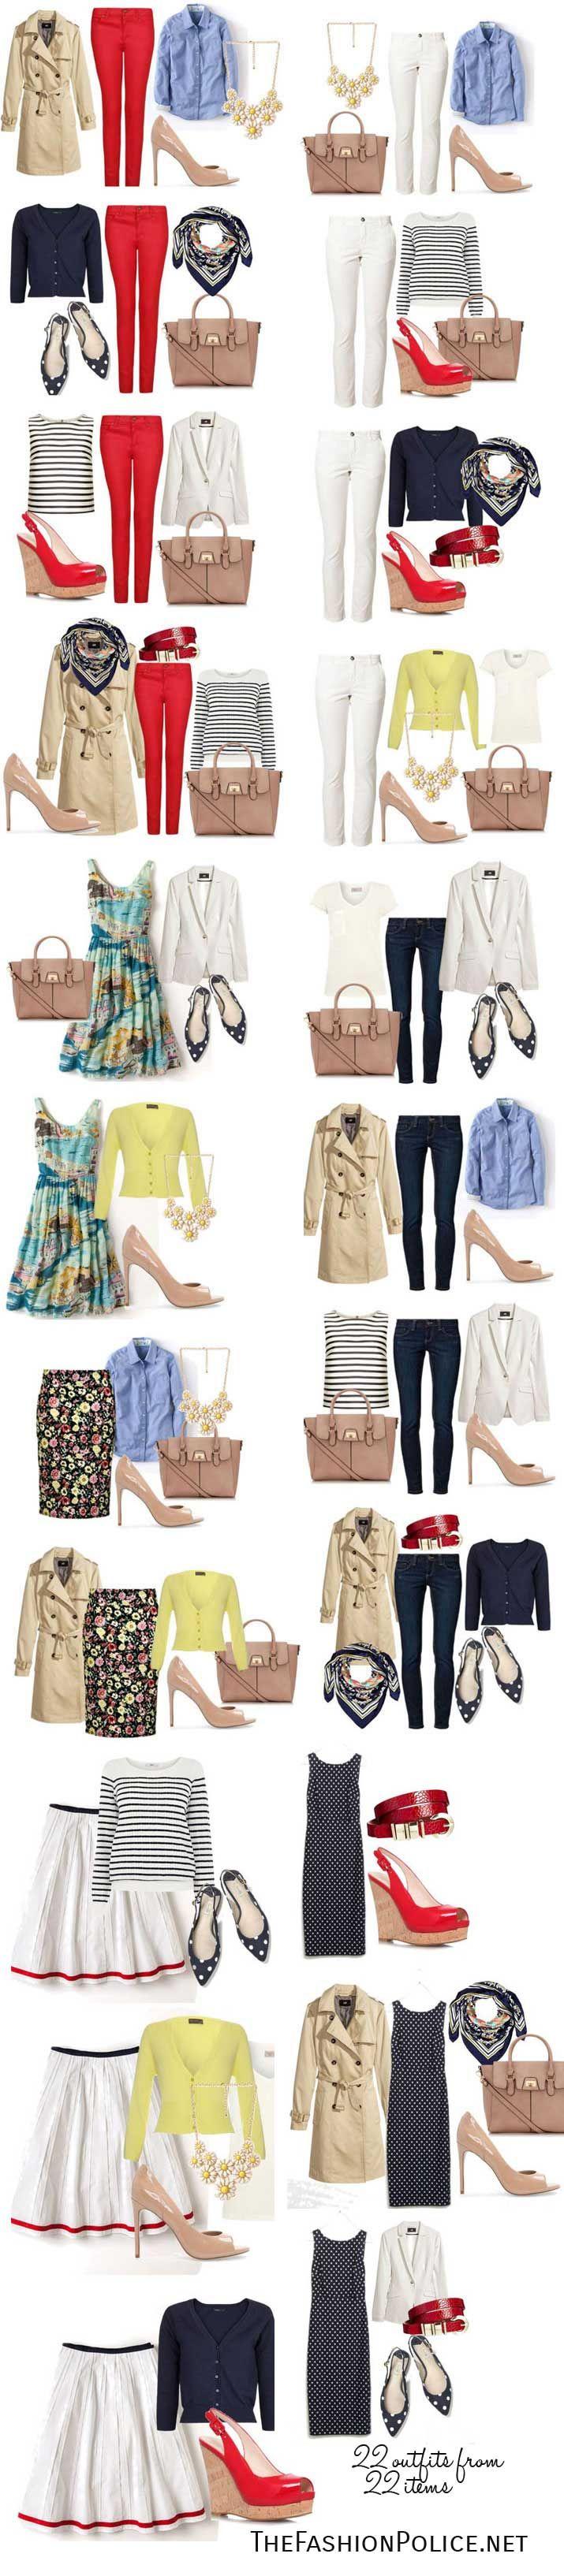 Spring Capsule Wardrobe 2014: Build a capsule wardrobe for spring 2014> The Fashion Police